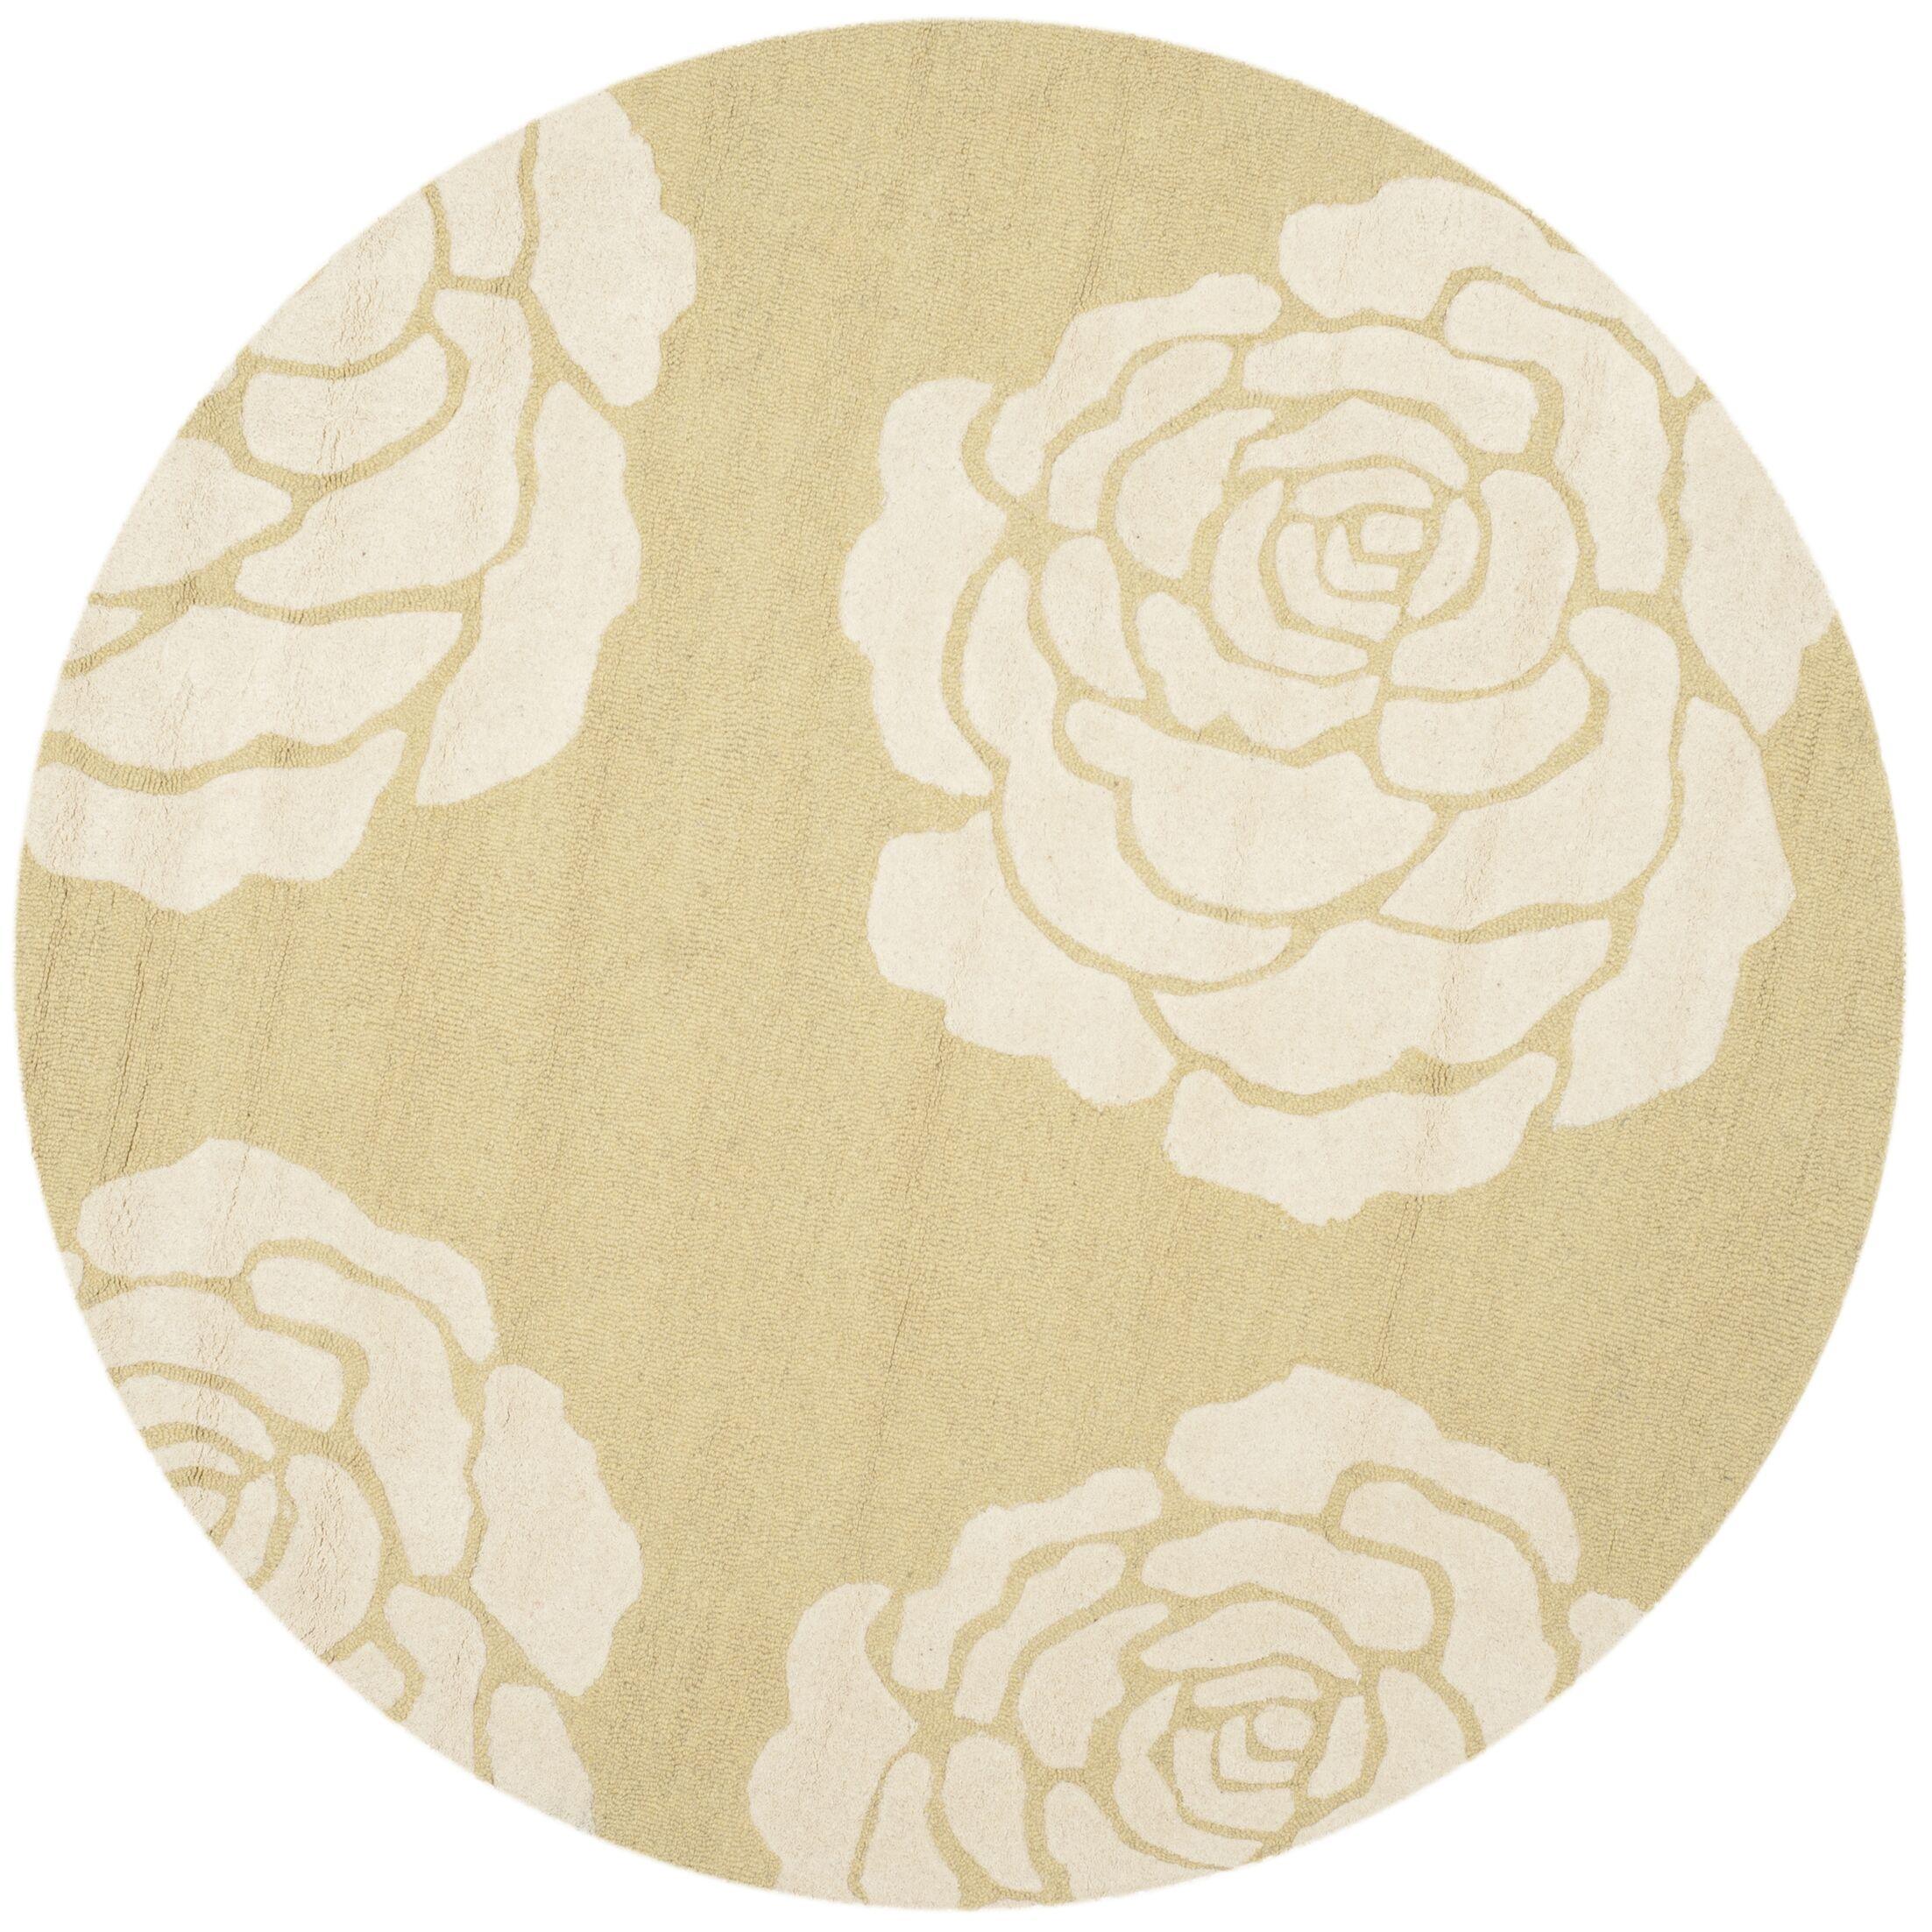 Martins Light Gold/Ivory Area Rug Rug Size: Round 6'